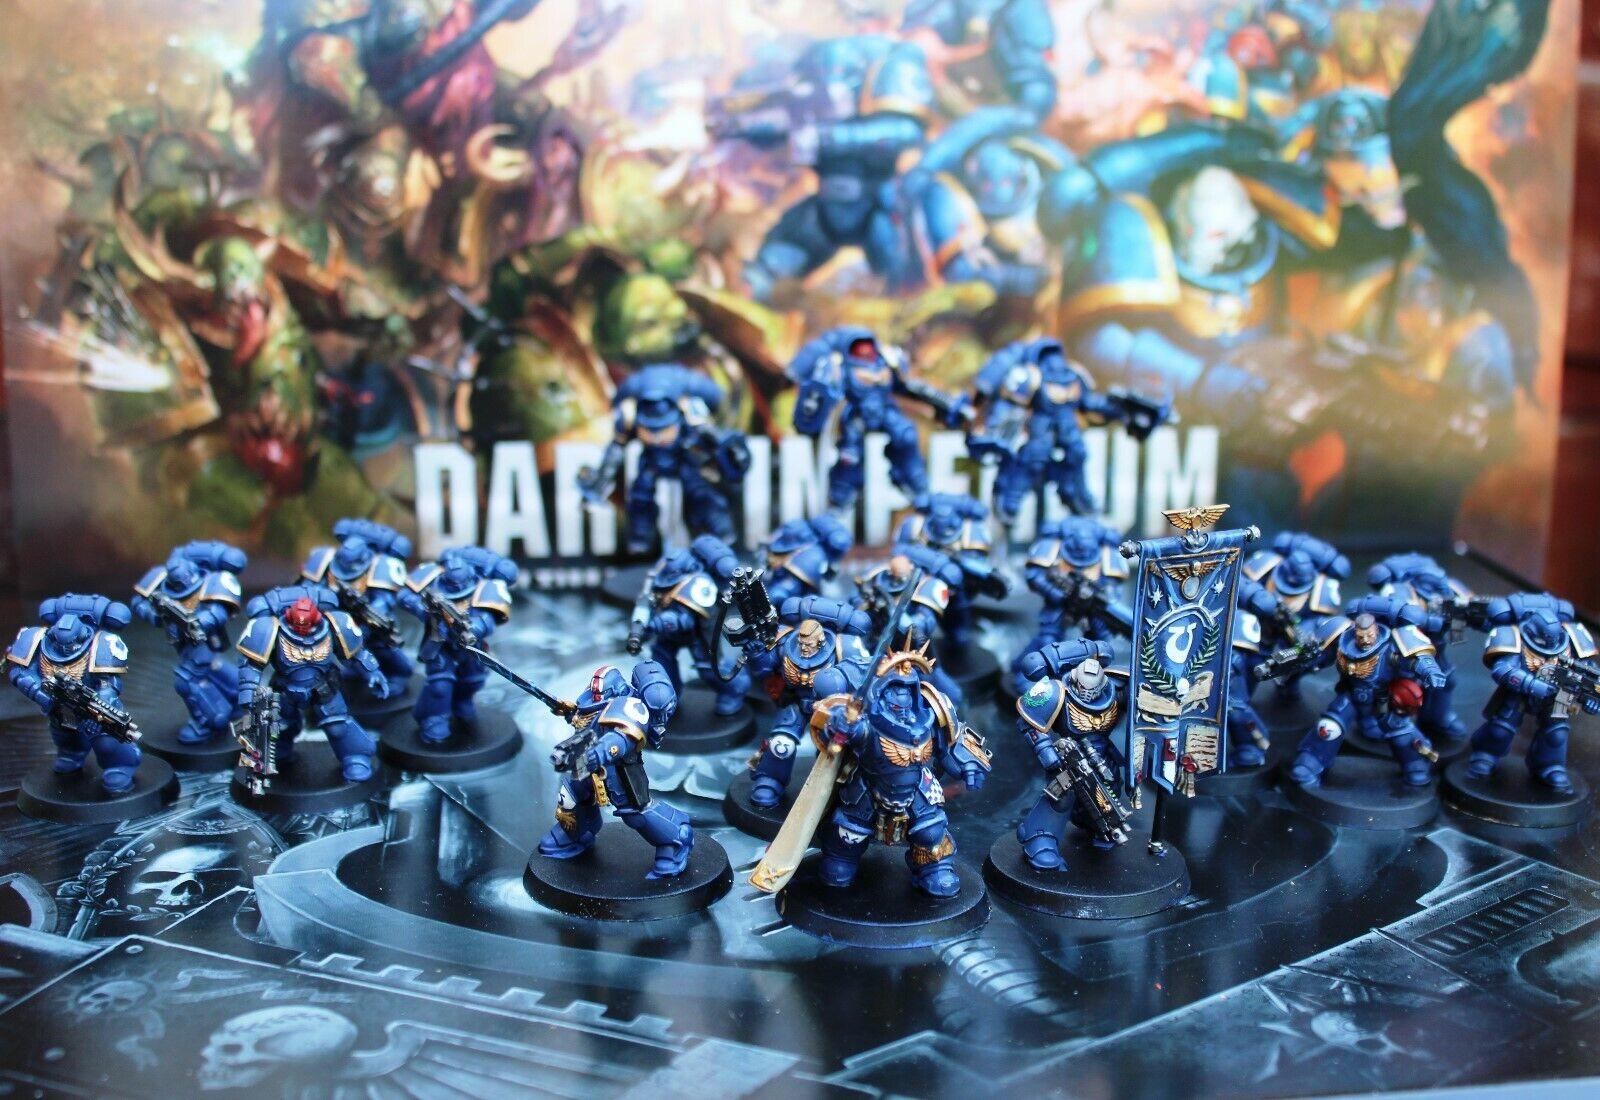 Primaris space marines army ultrmarines dark imperium Pro painted  made to order